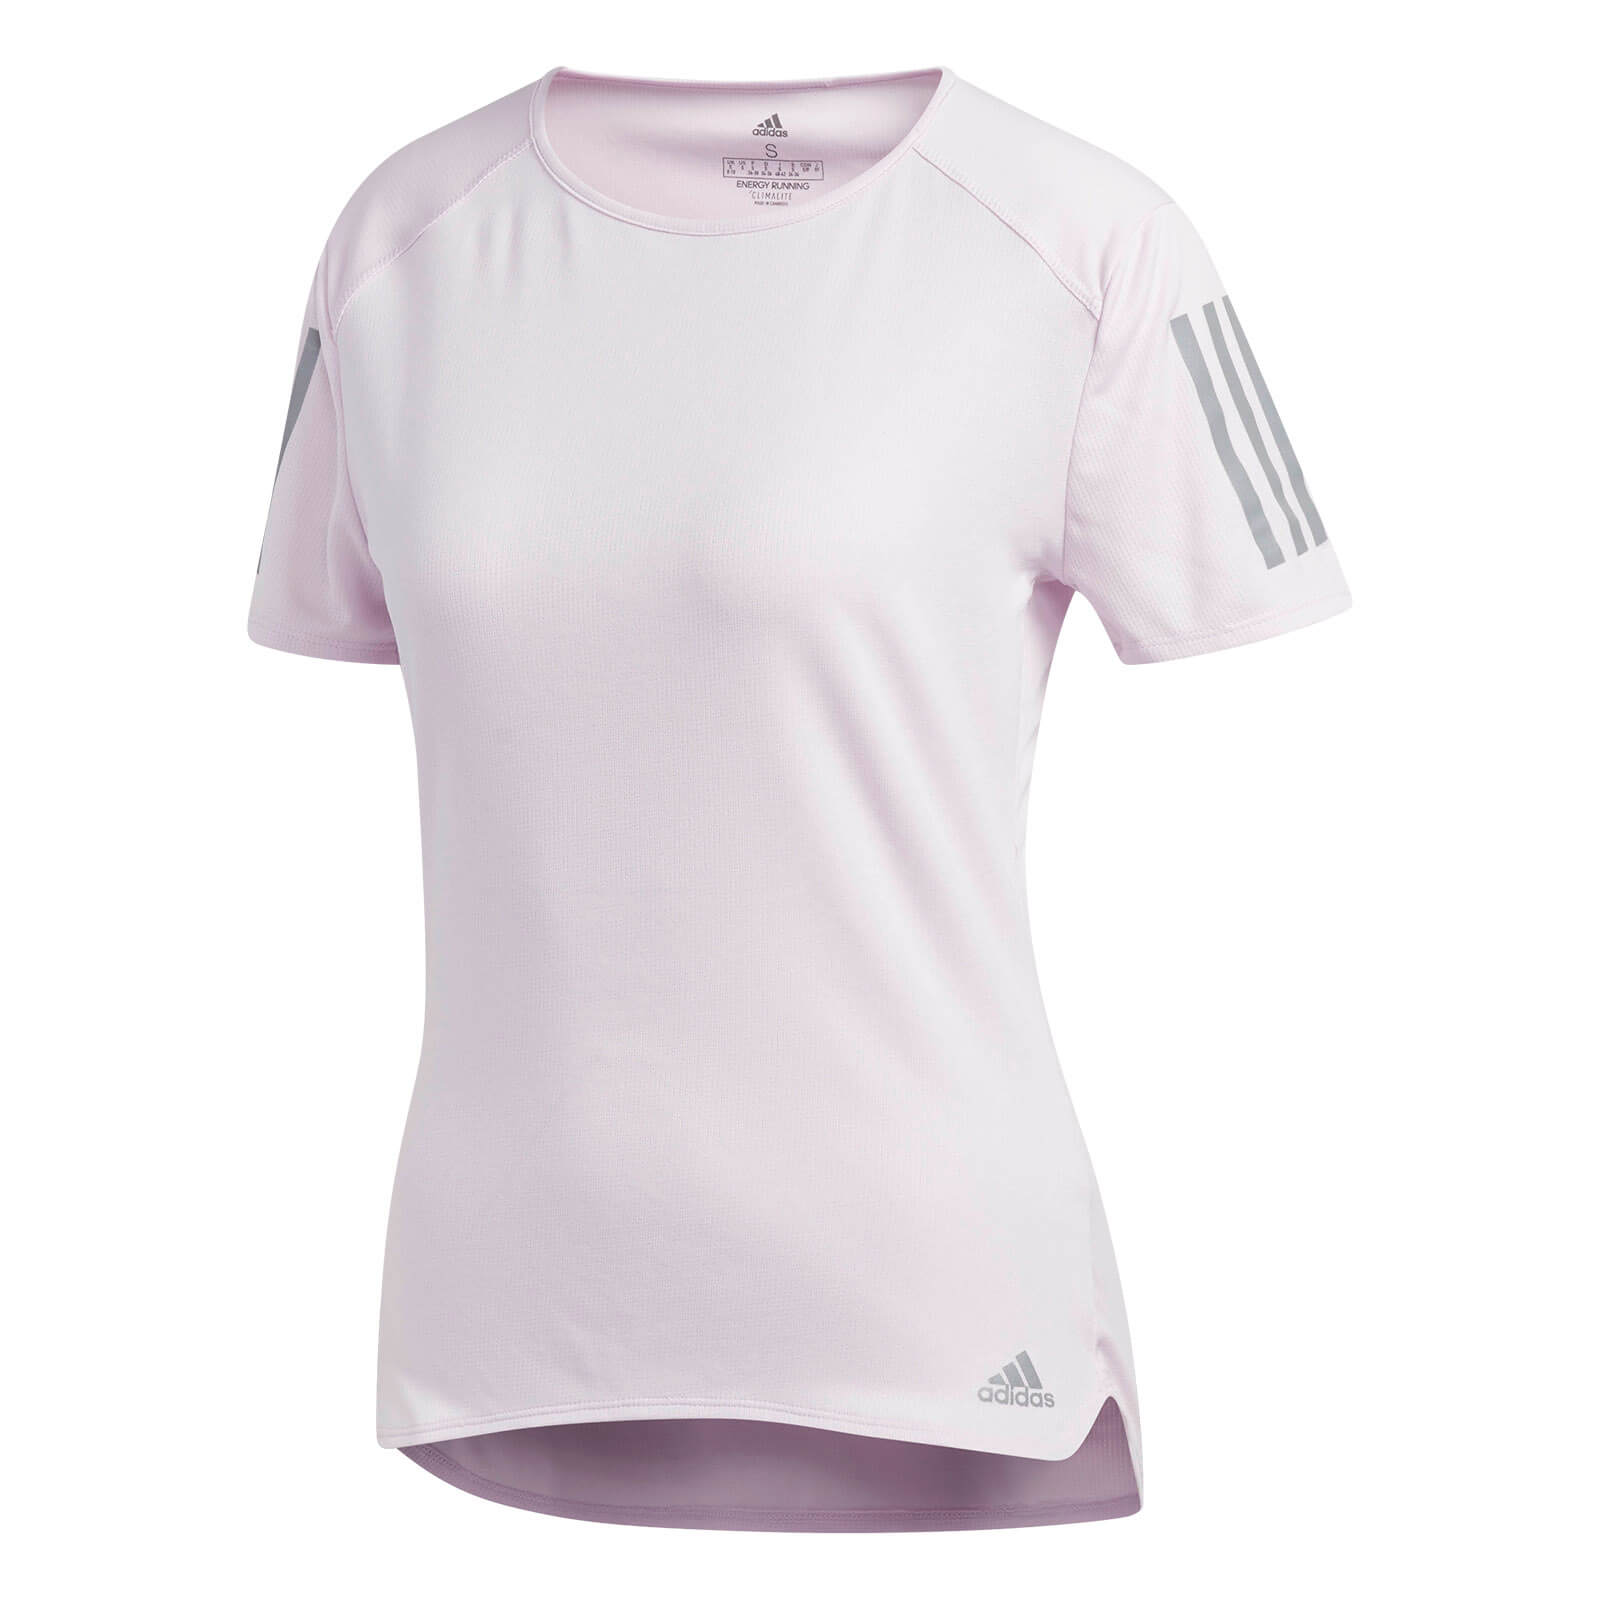 adidas shirt pink